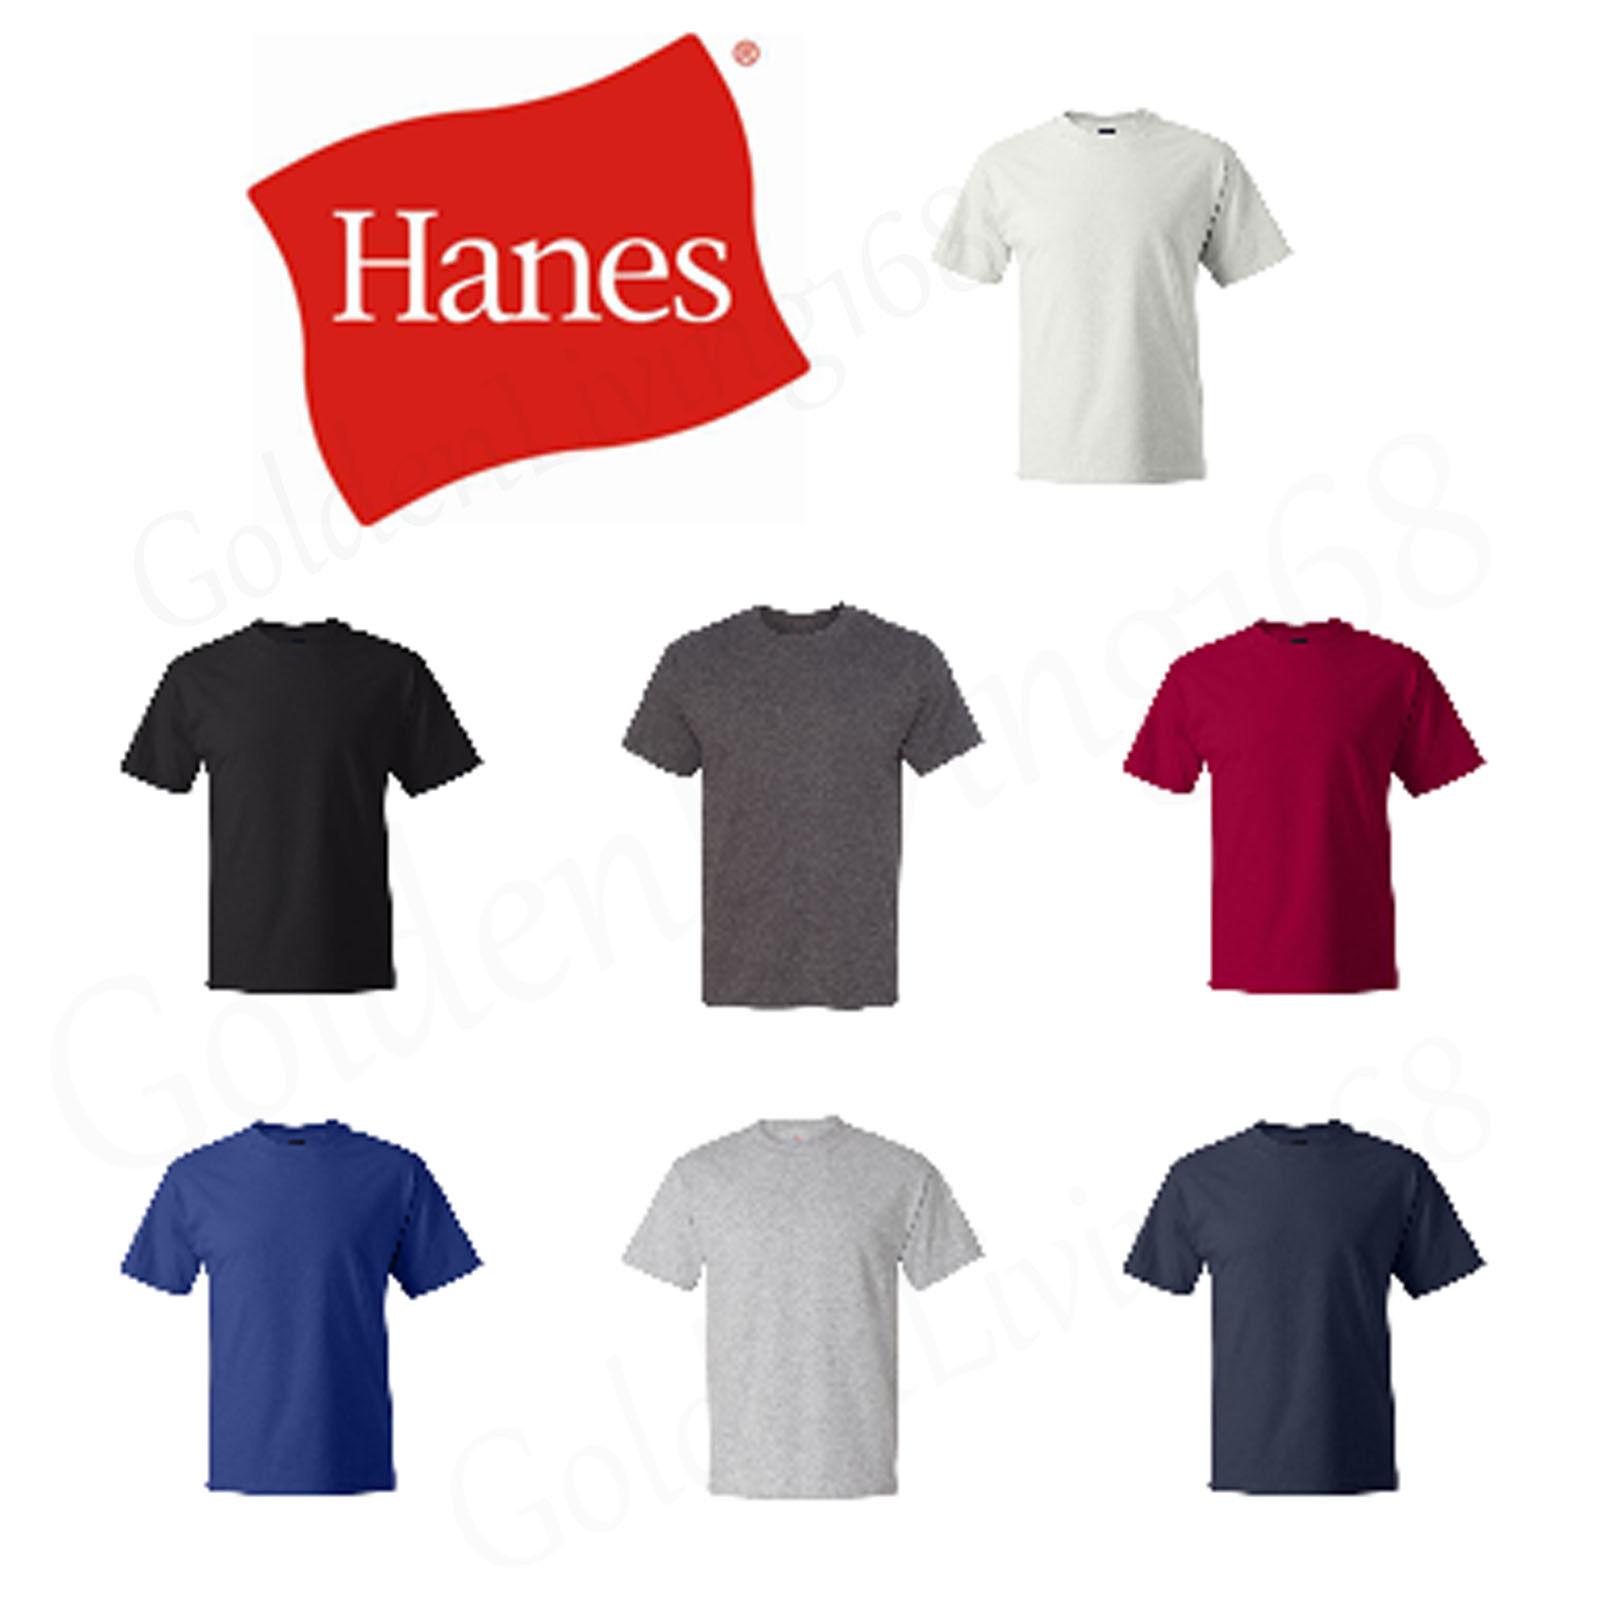 Hanes Beefy-T Tall T-Shirt 518T Short Sleeve Cotton LT XLT 2XLT 3XLT 4XLT